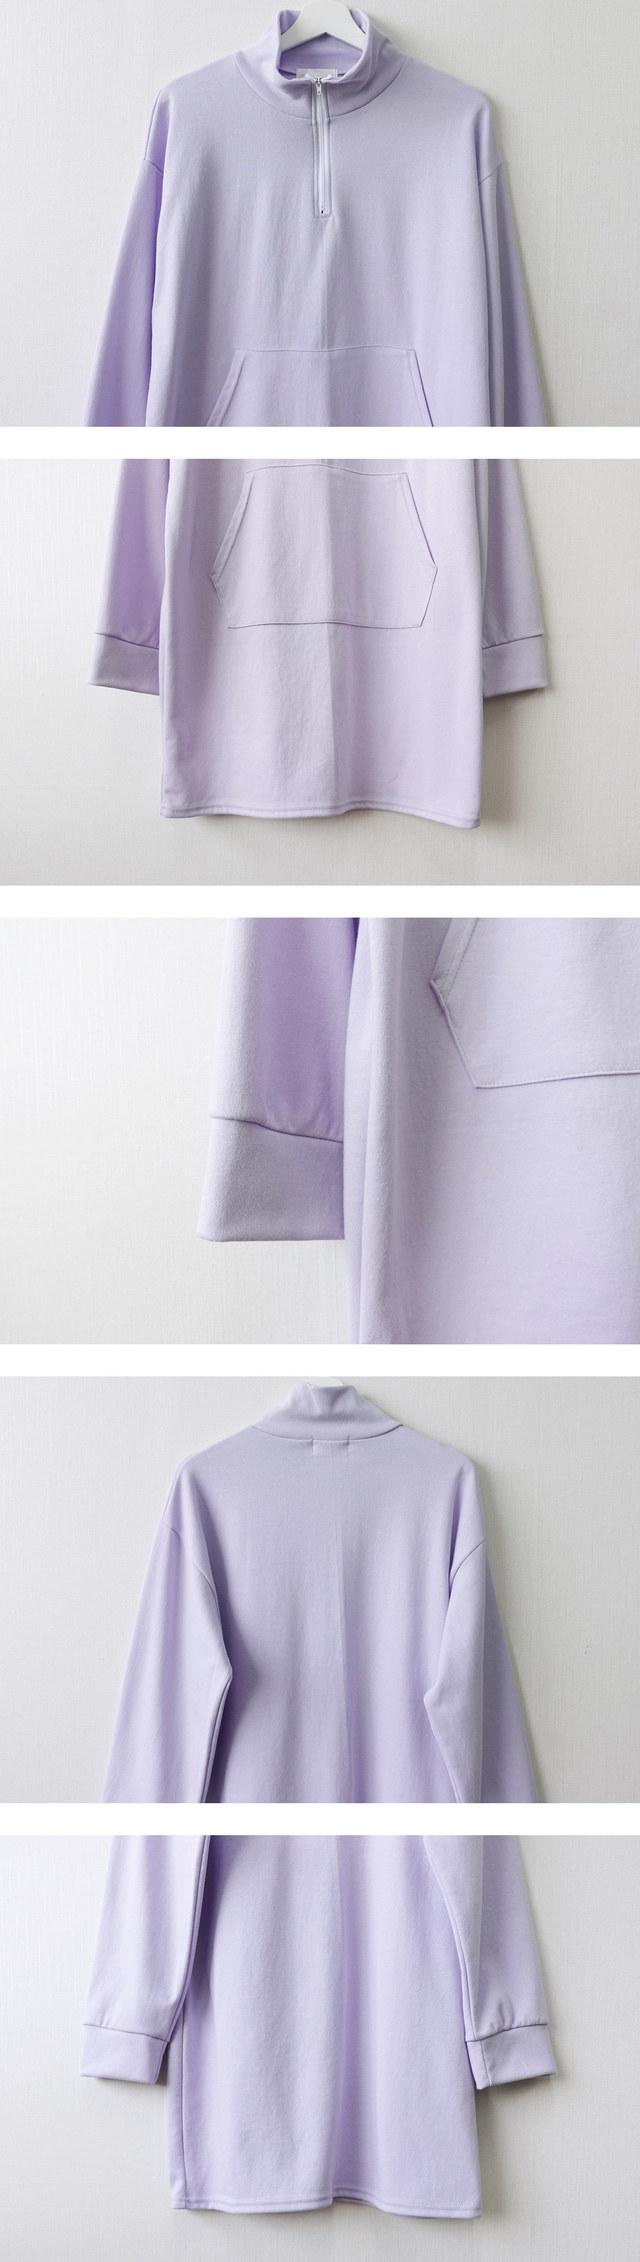 Anorak half-packed business mini pocket